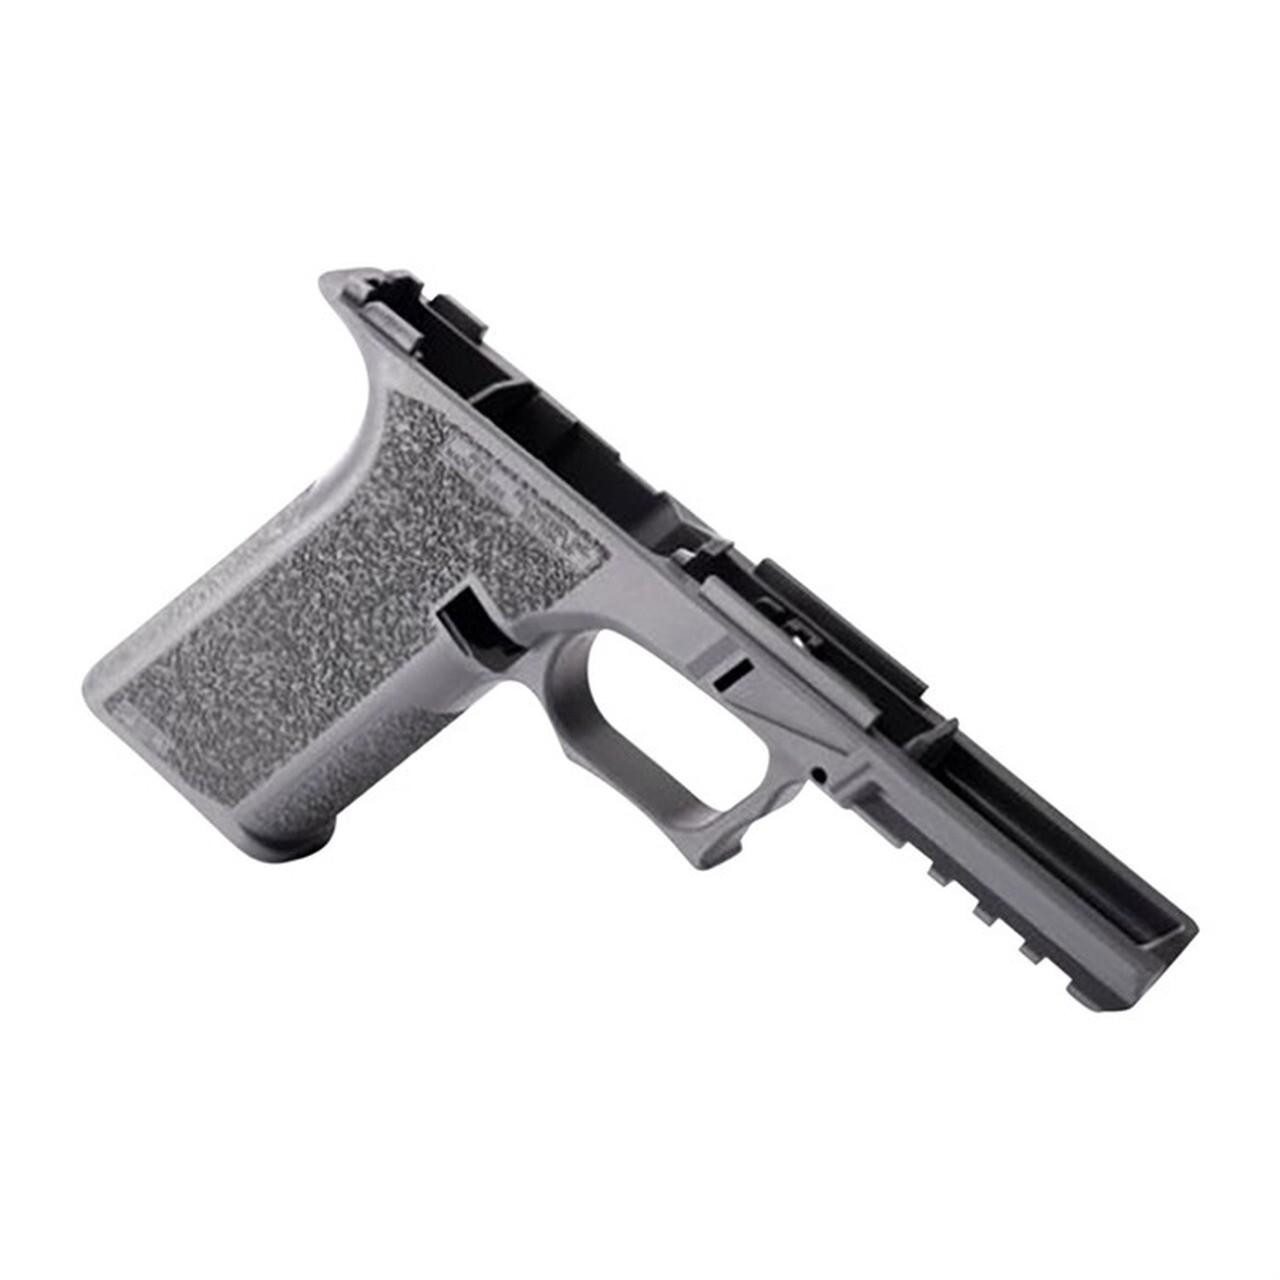 Polymer80 PF45GRAY G21/20 Gen3 Compatible 80% Pistol Frame Kit Glock 21/20 Gen3 Polymer